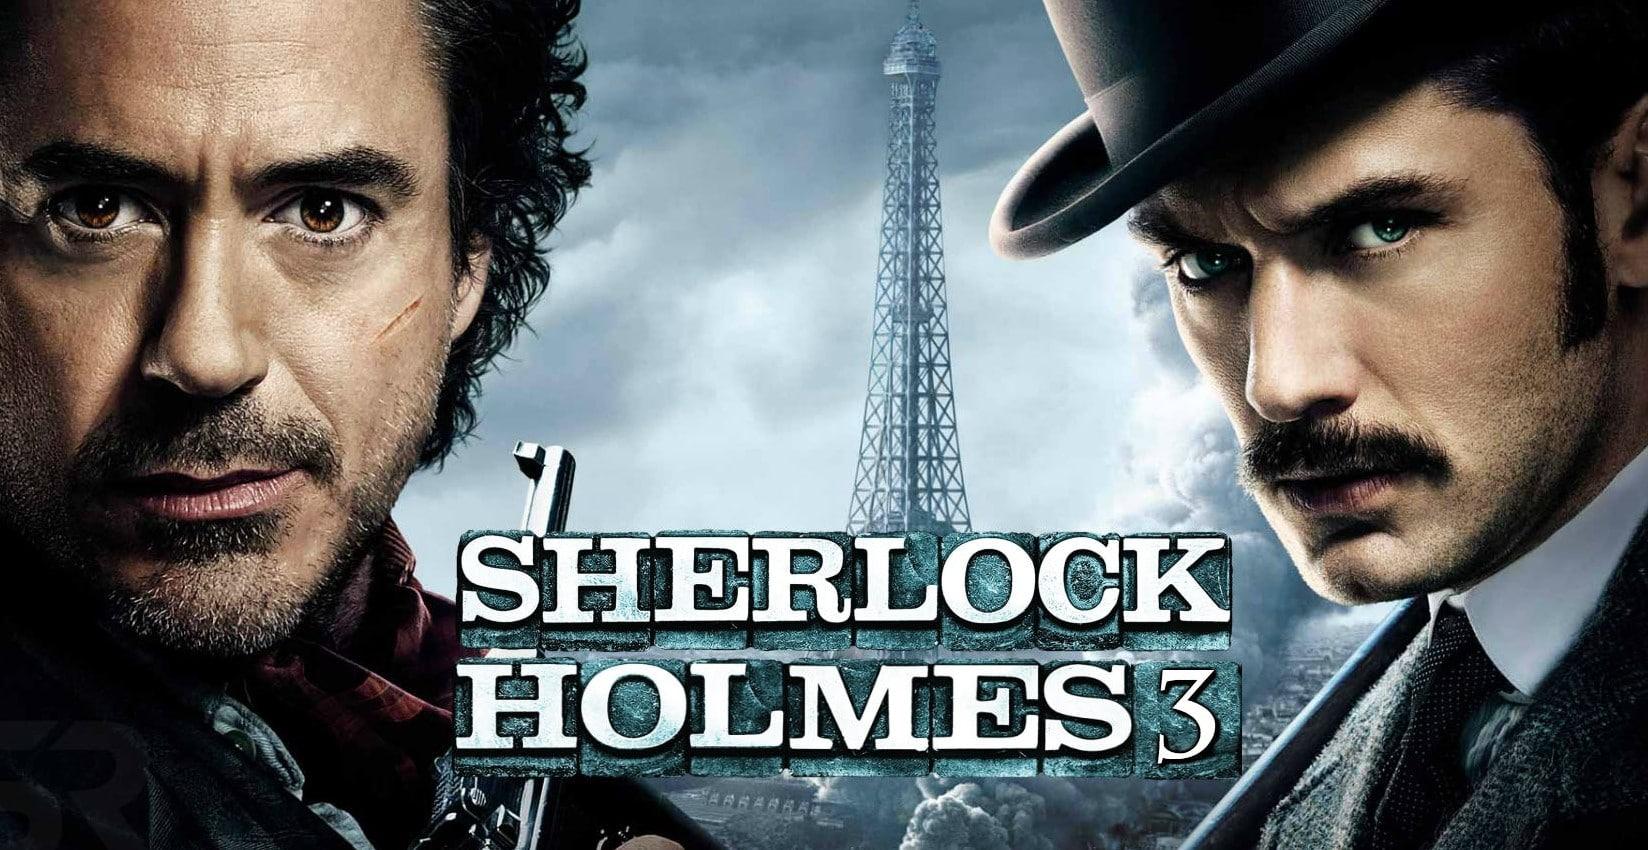 Sherlock-Holmes-3-Robert-Downey-Jr-Jude-Law-Sequel